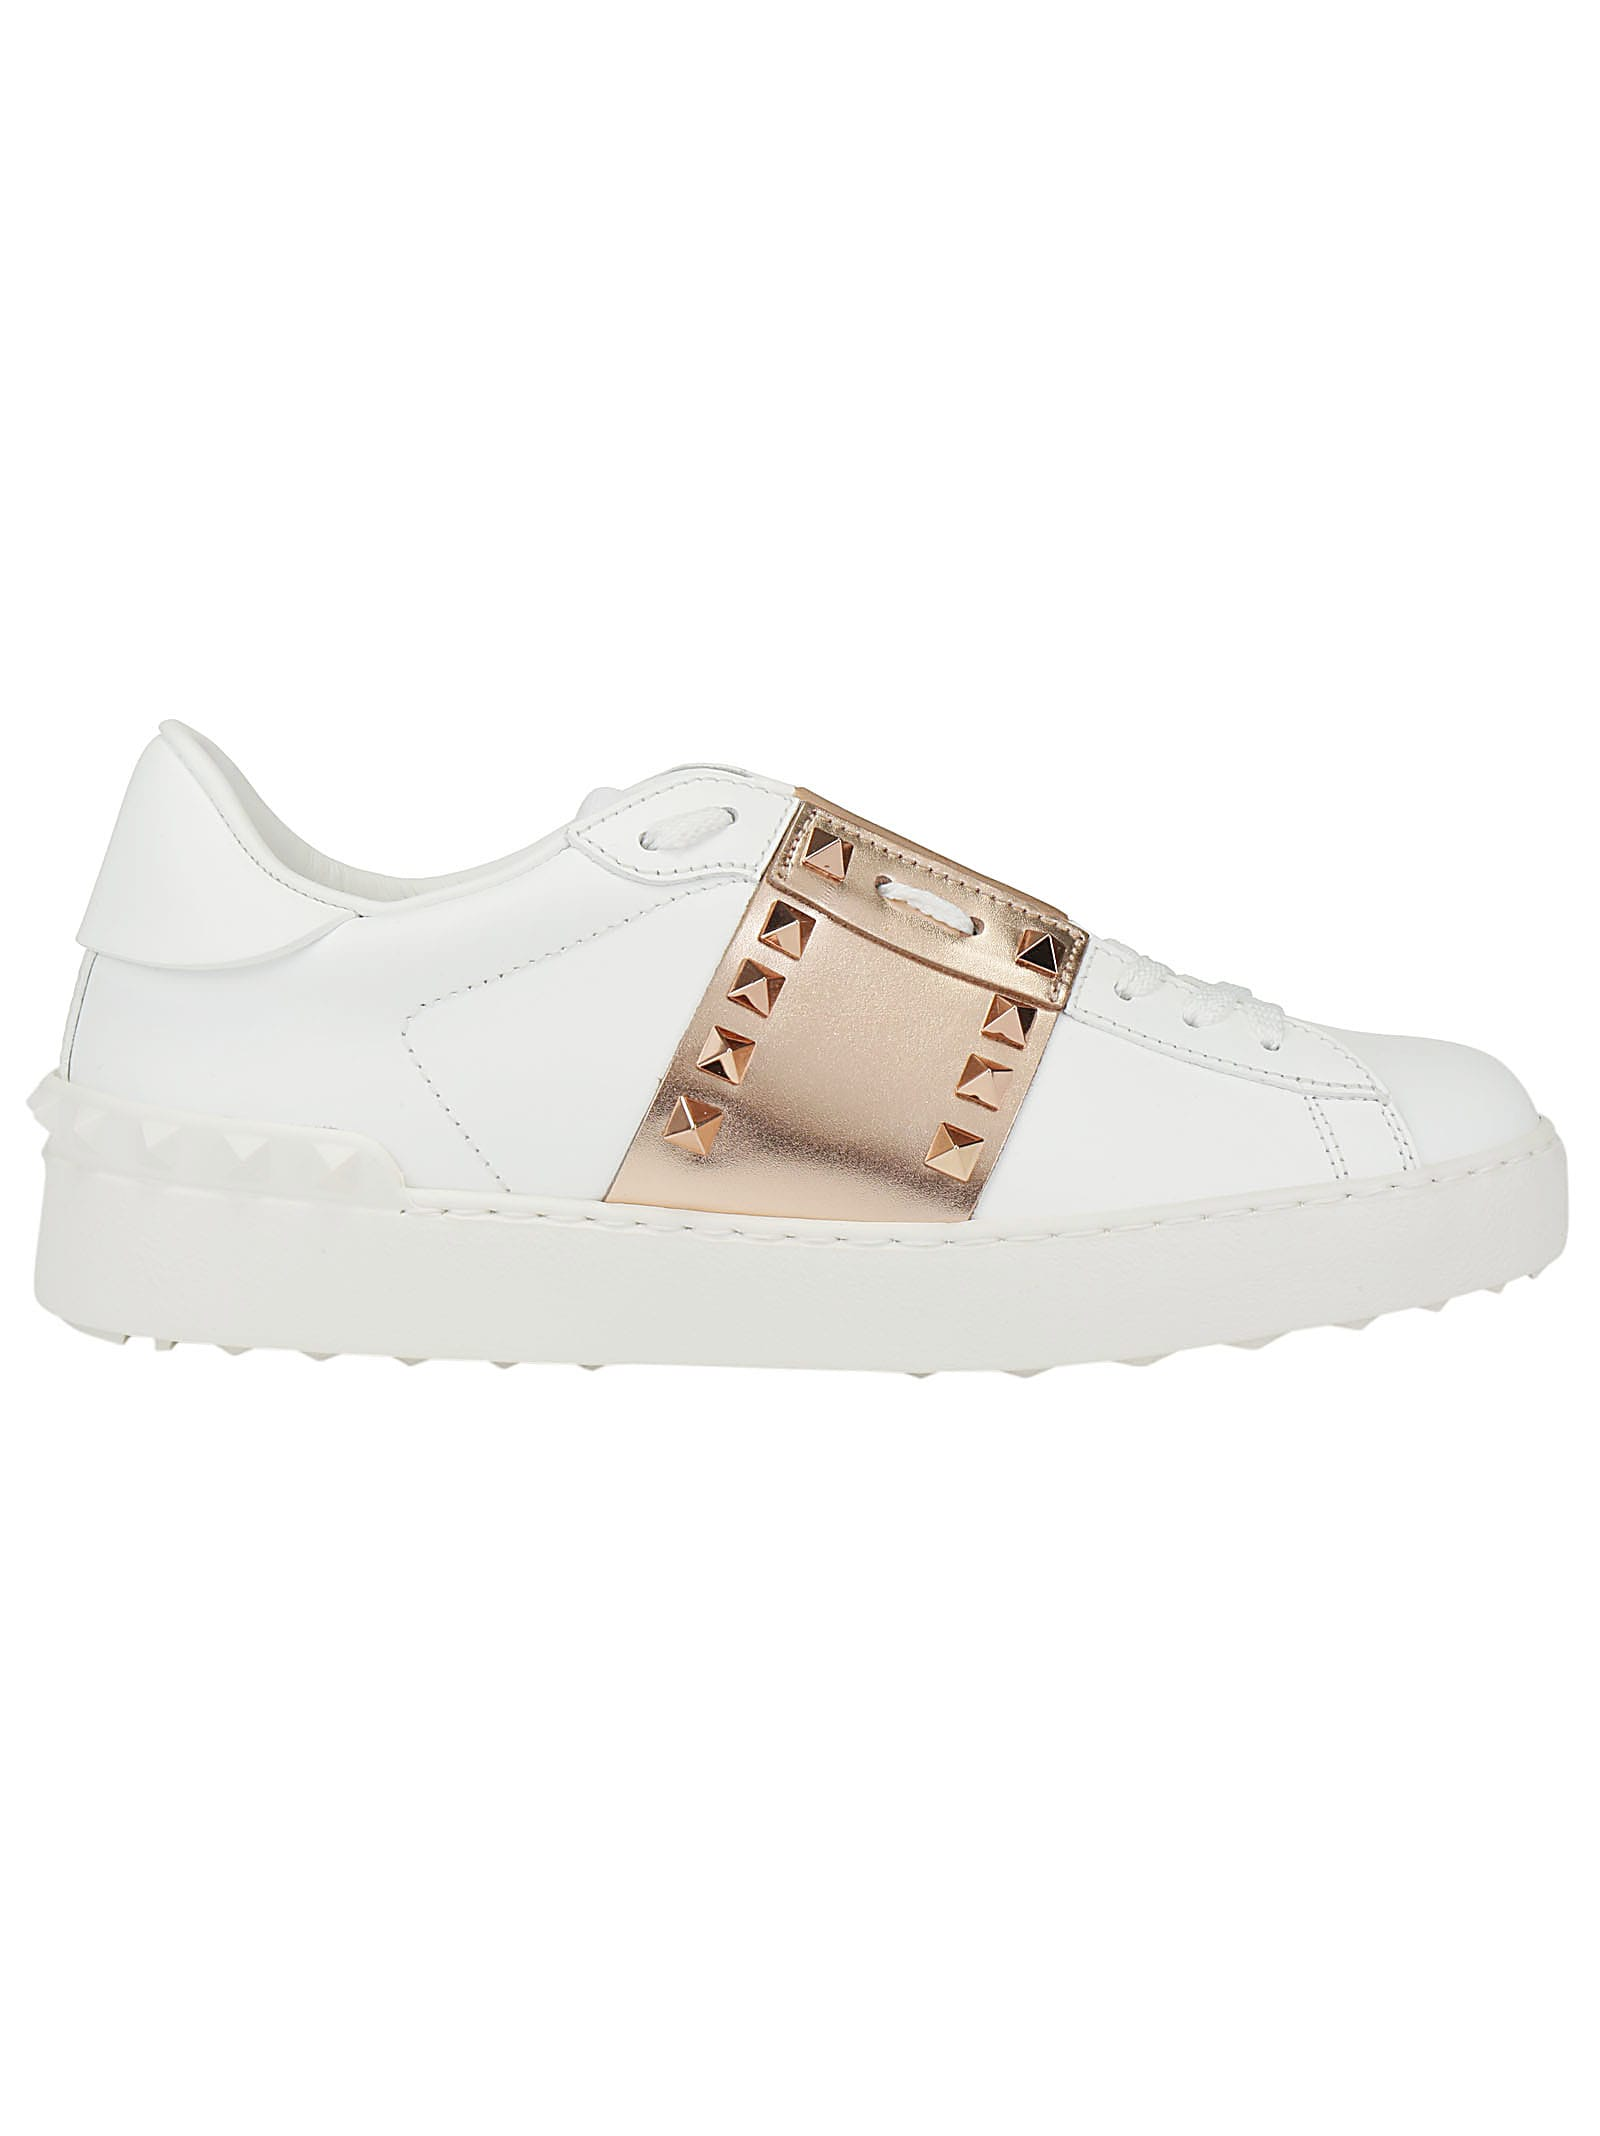 Valentino Garavani Sneakers | italist